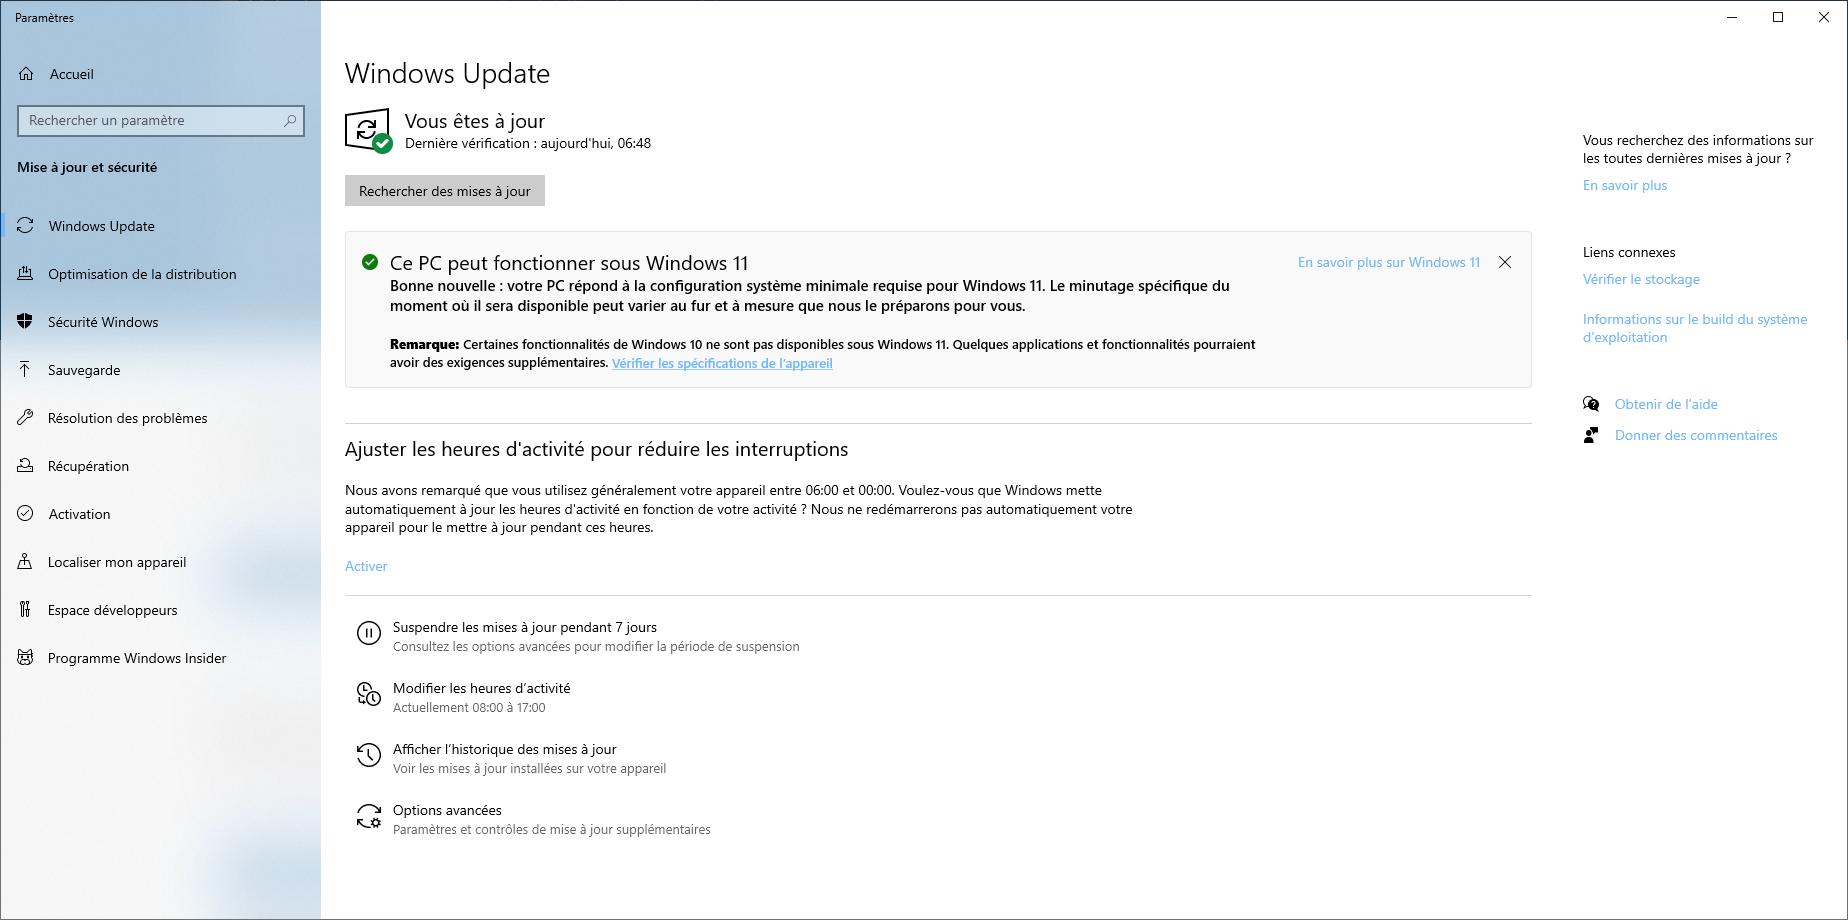 Windows 11 Update